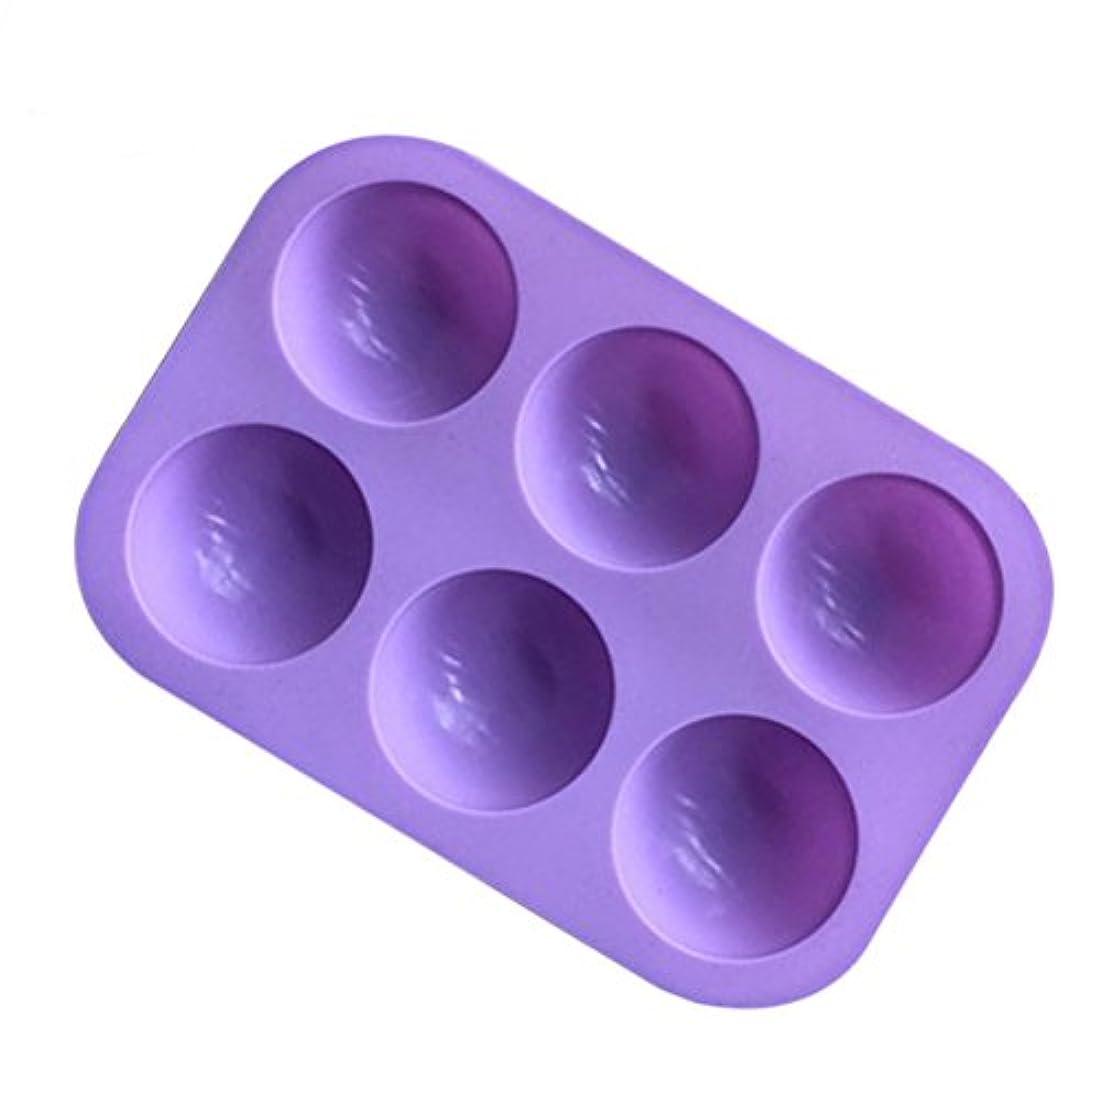 BESTONZON シリコンソープモールド半円マフィンパンカップケーキキャンディモールドケーキチョコレートモールドベーキングモールド6個のキャビティ(紫色)